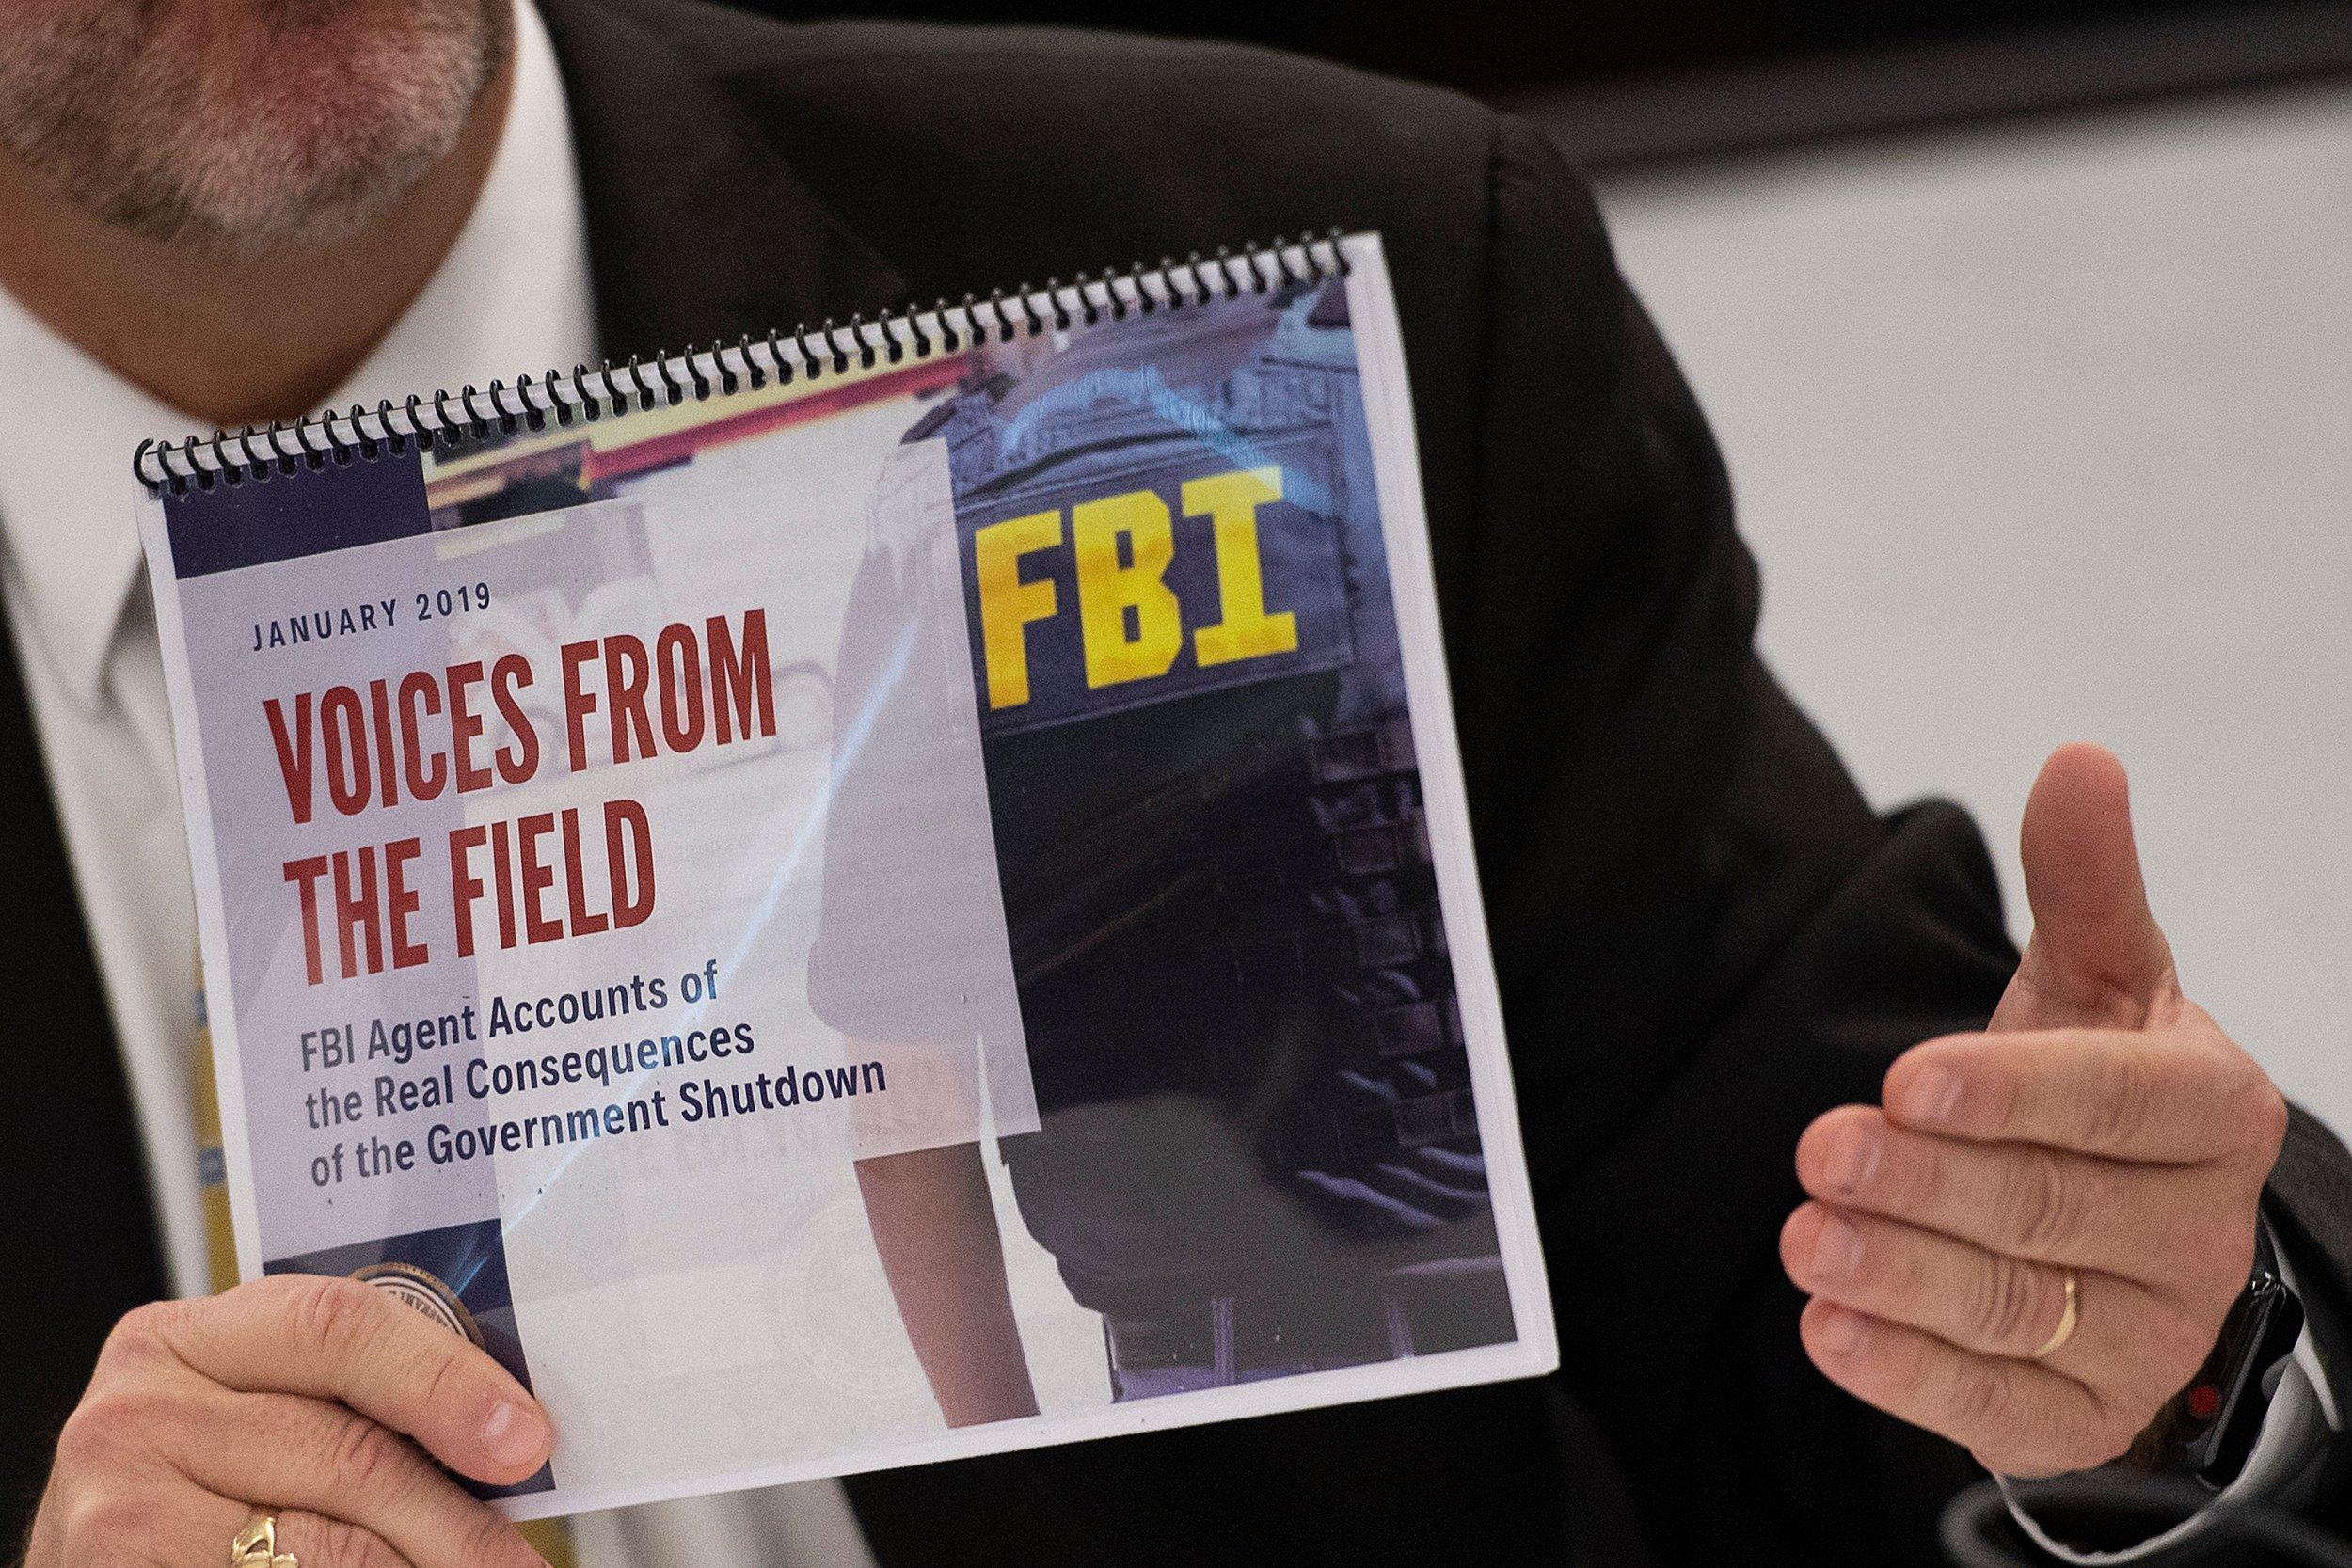 FBI, agents, shutdown, consequences